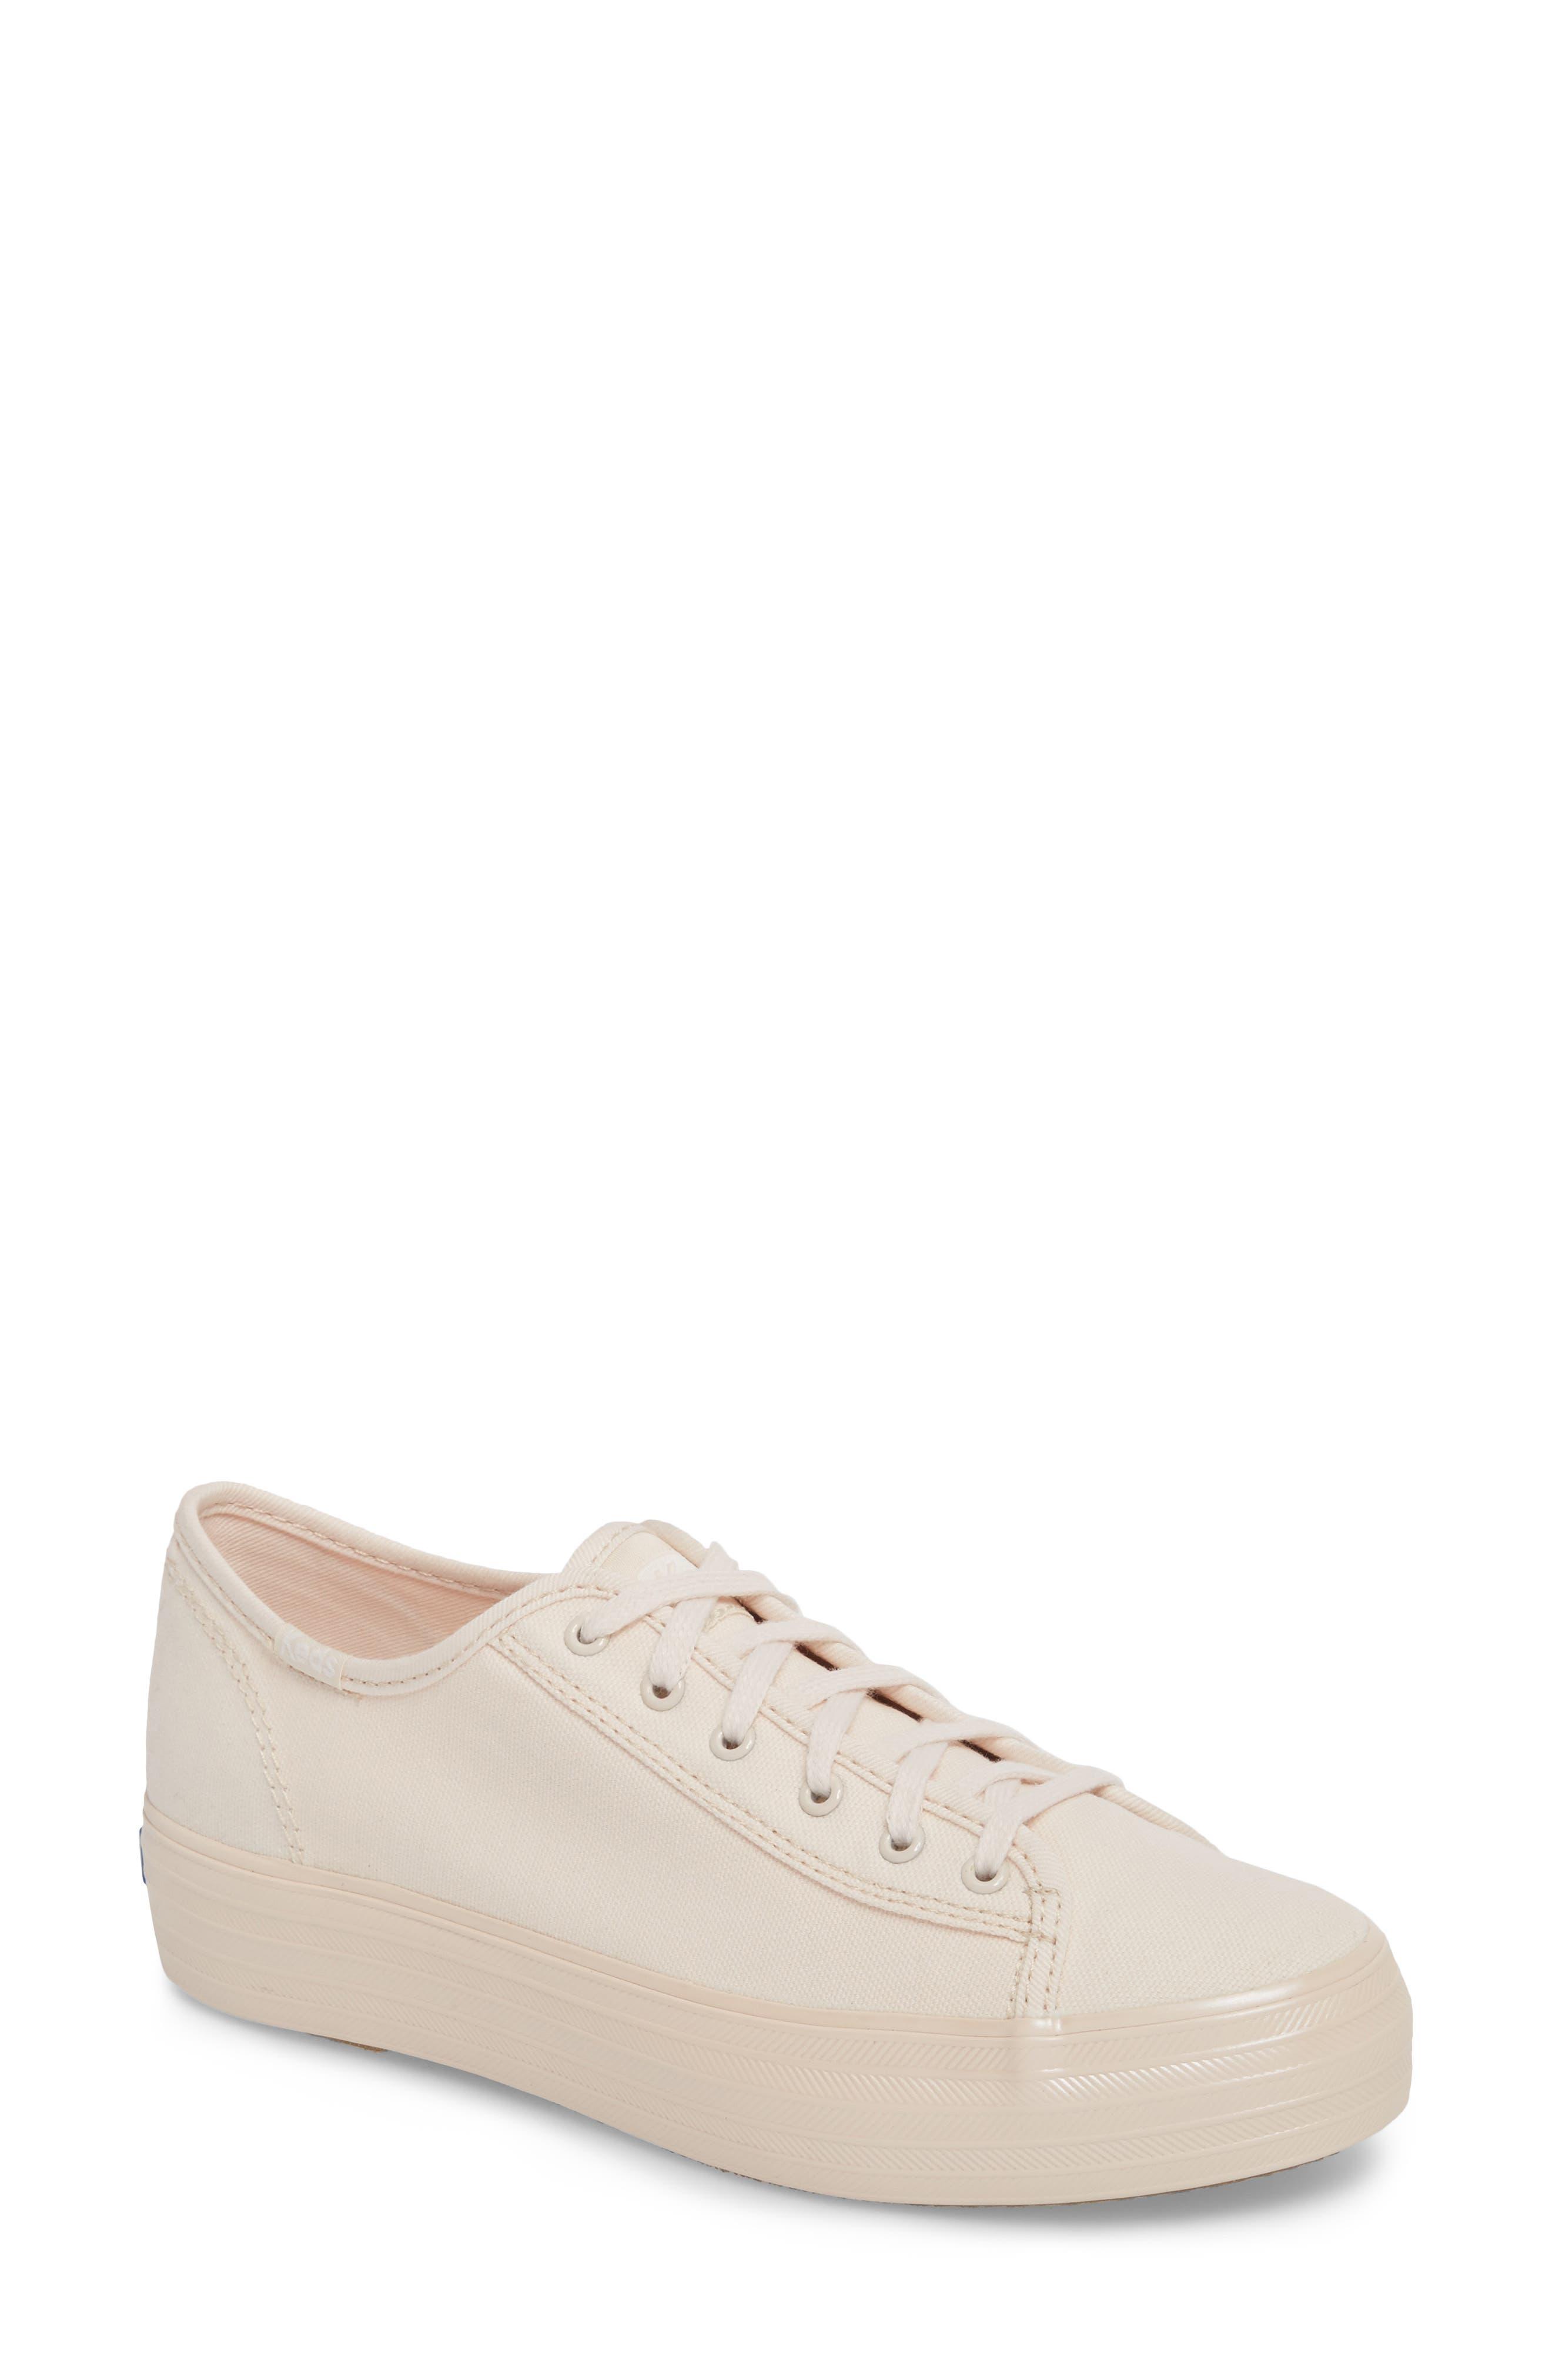 Keds® Triple Kick Lace-Up Sneaker (Women)